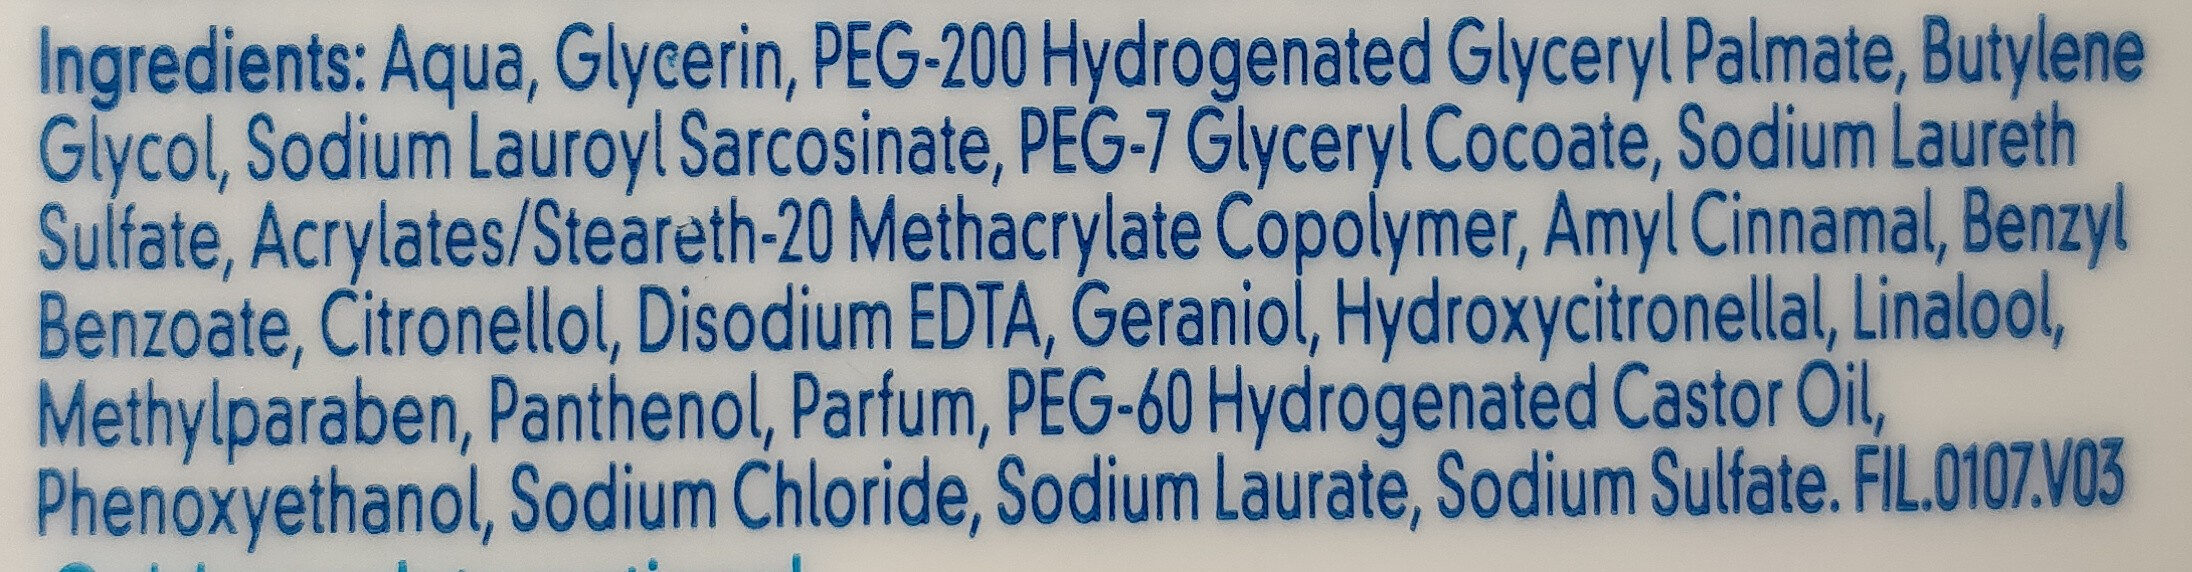 Cetaphil Facial Cleanser - Ingredients - fr